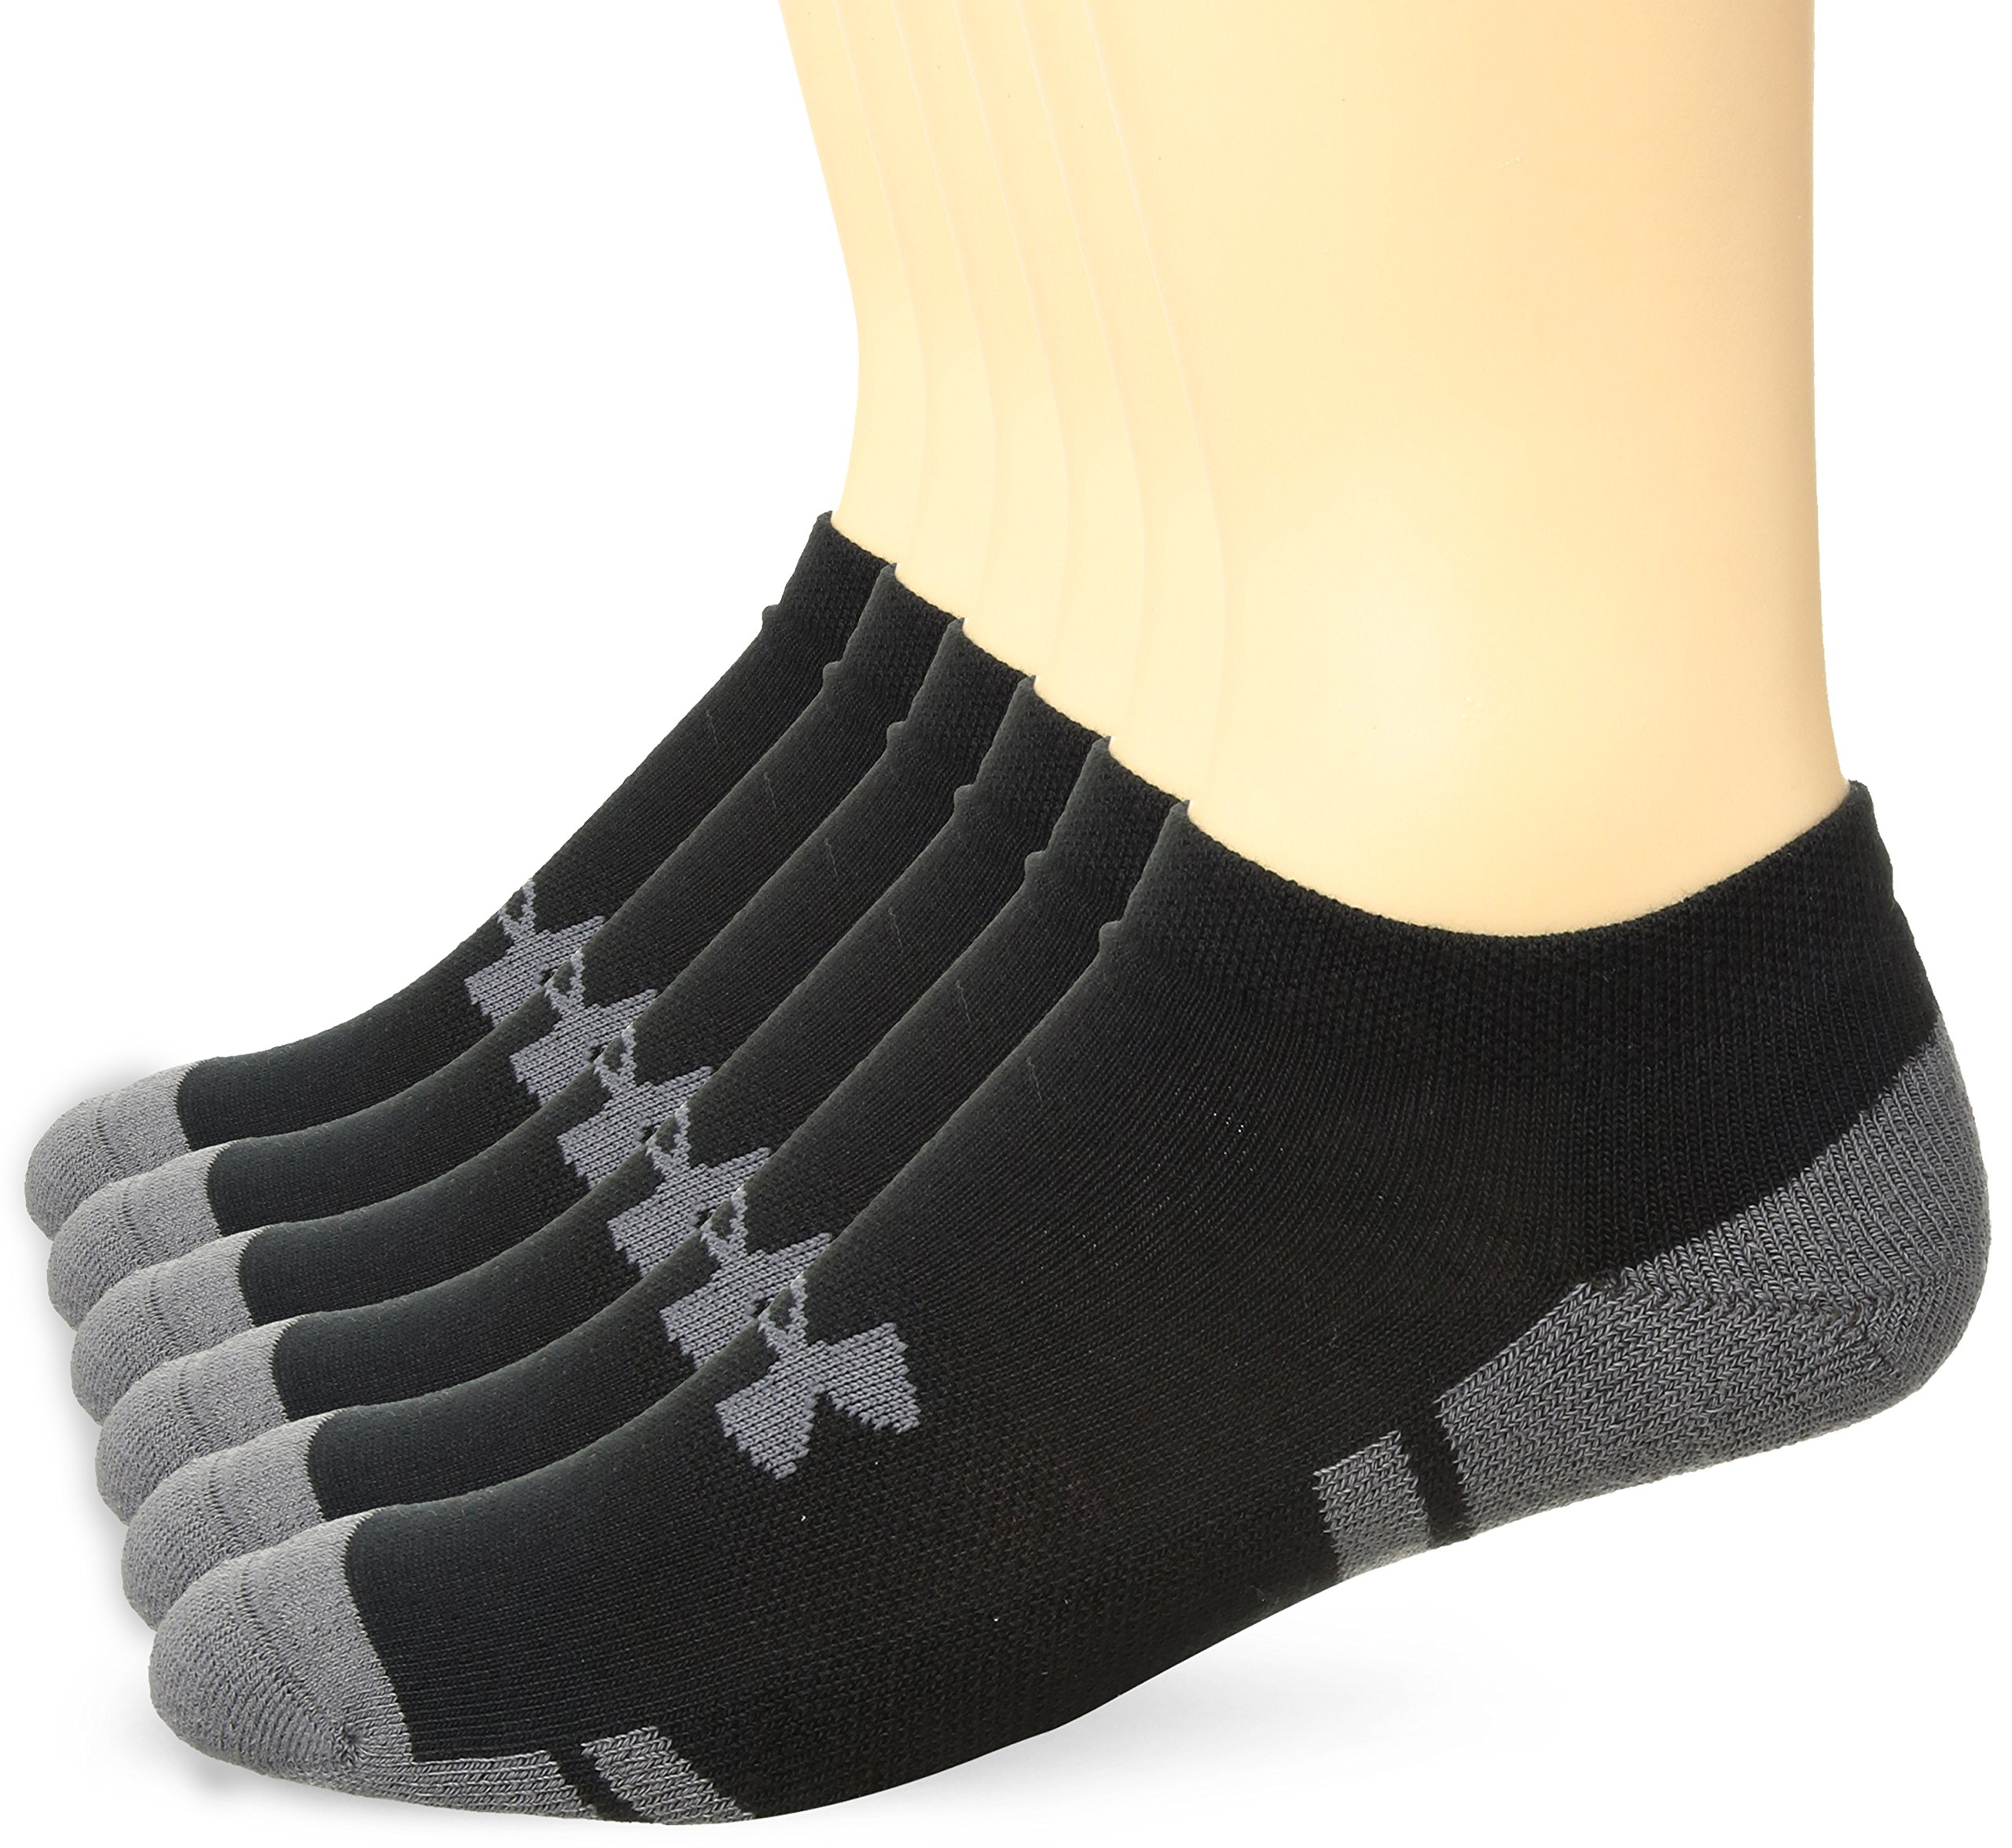 Under Armour Men's Resistor 3.0 No Show Socks, Large, Black/Graphite